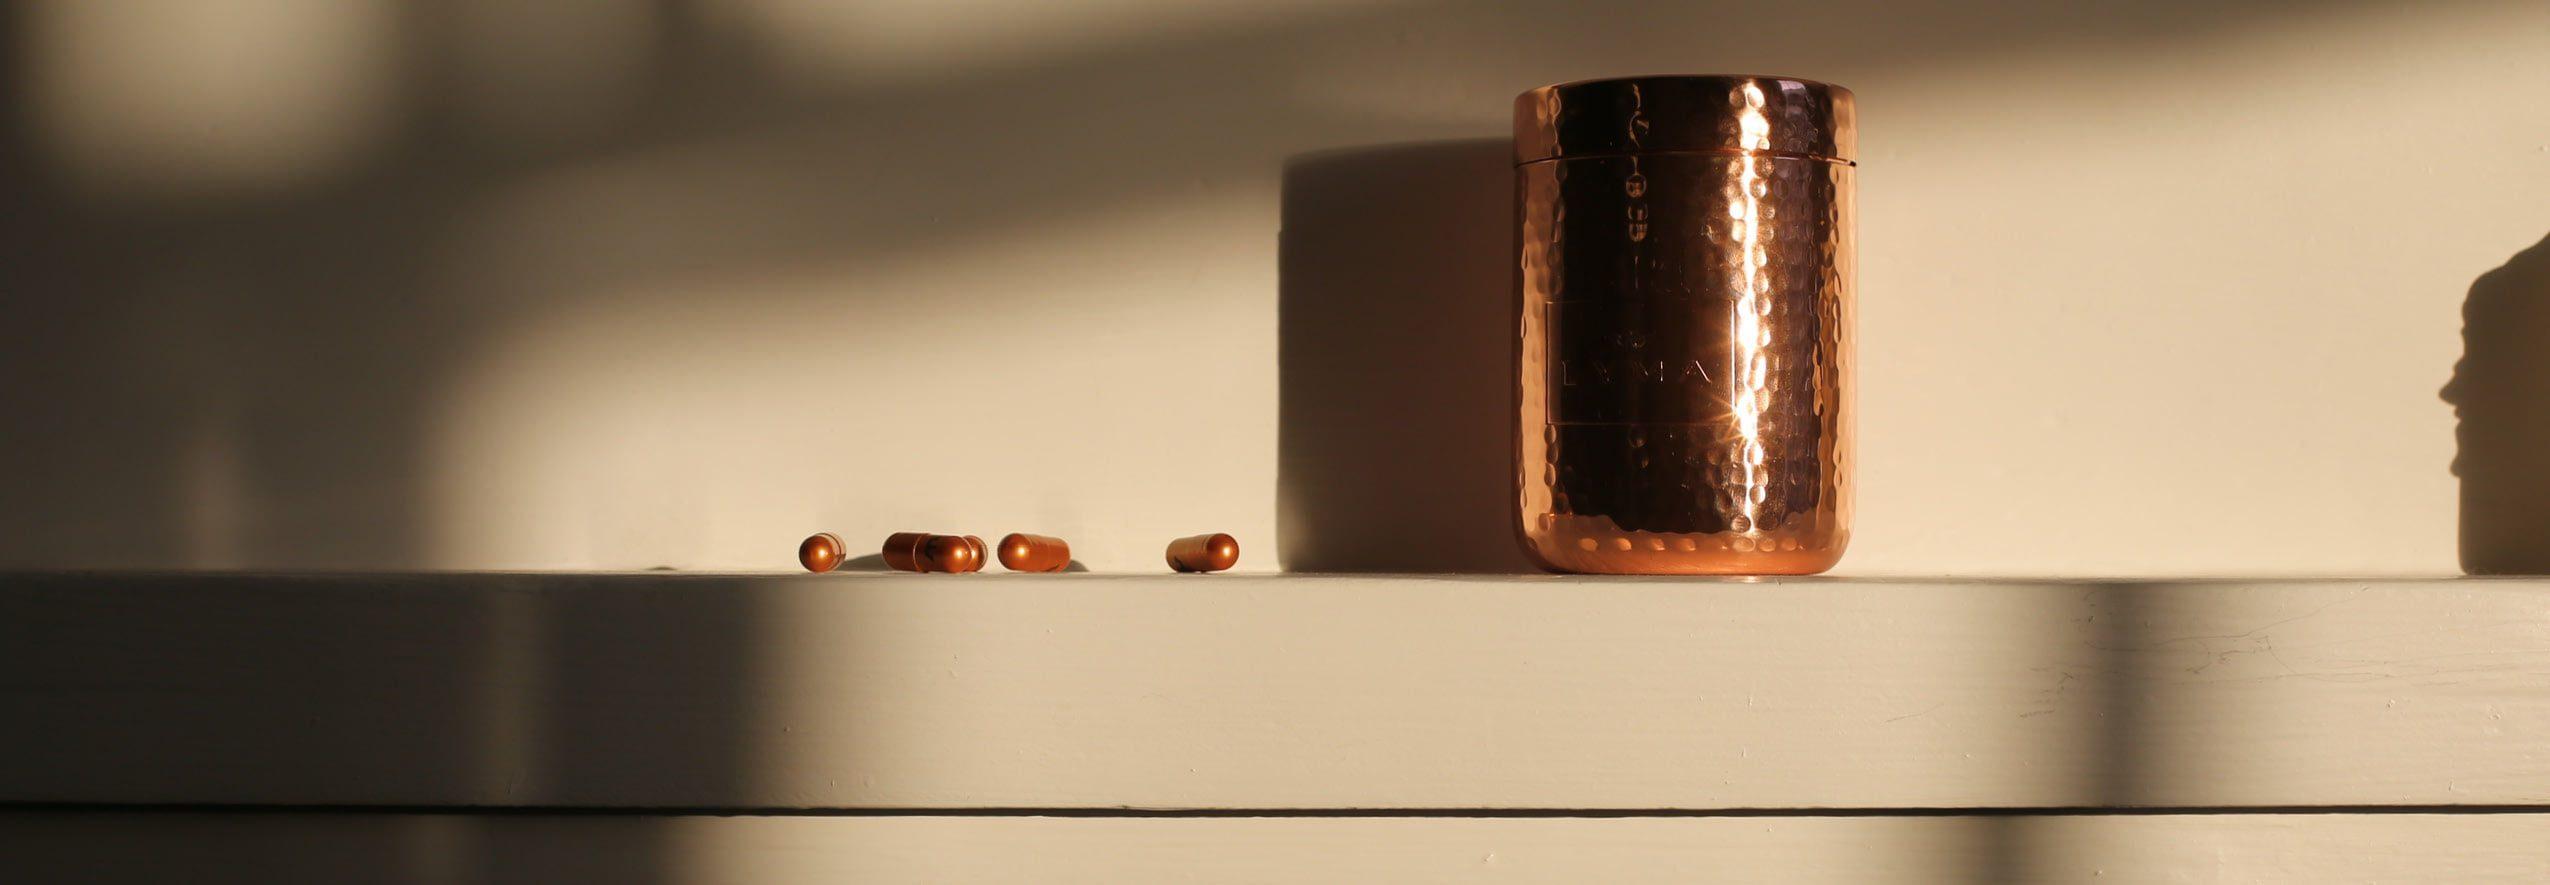 capsules on shelf